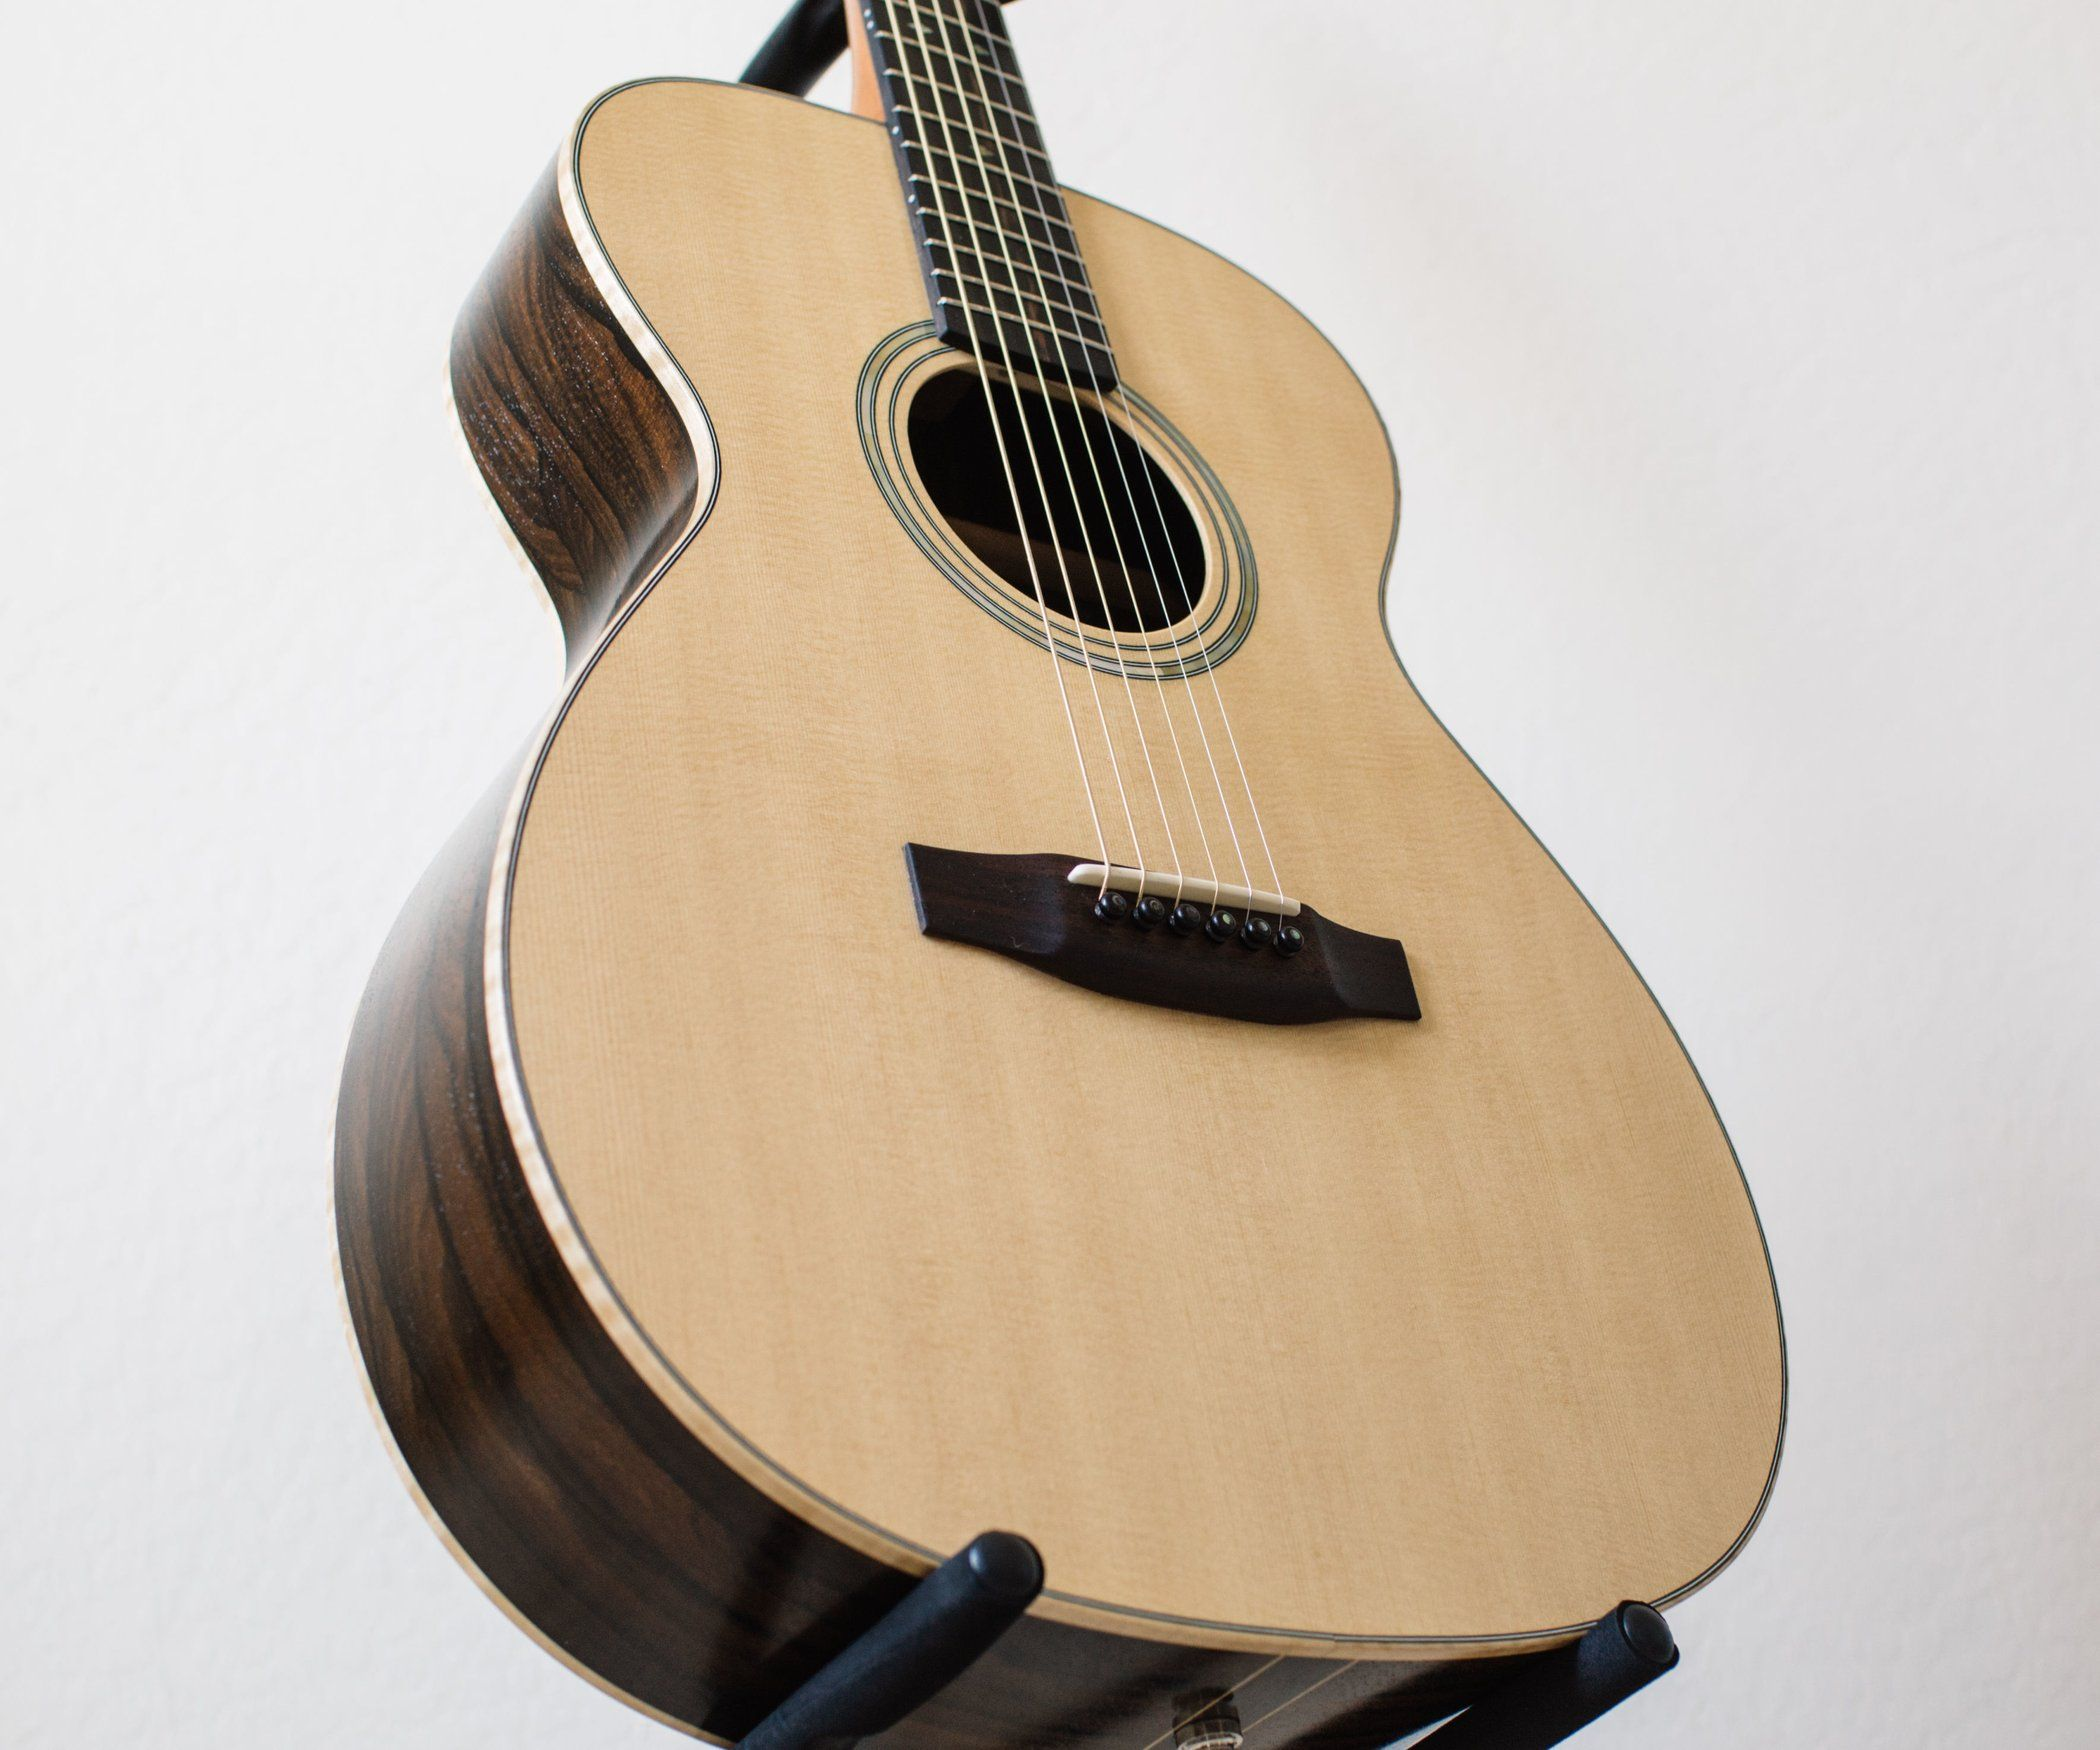 Building An Acoustic Guitar Guitar Acoustic Guitar Diy Musical Instruments